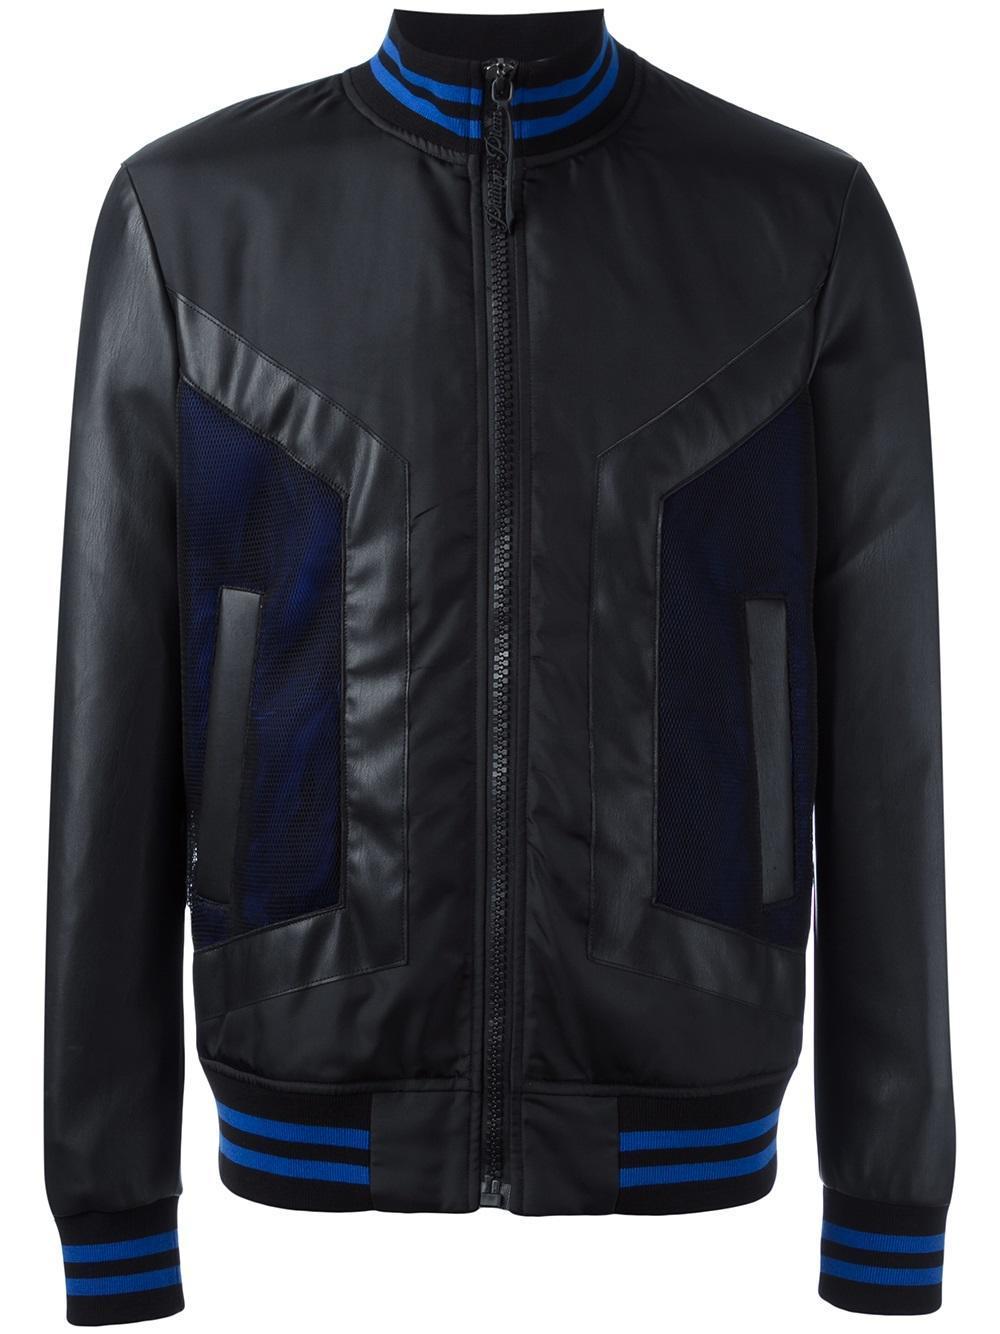 philipp plein 39 centaru 39 bomber jacket in black for men lyst. Black Bedroom Furniture Sets. Home Design Ideas